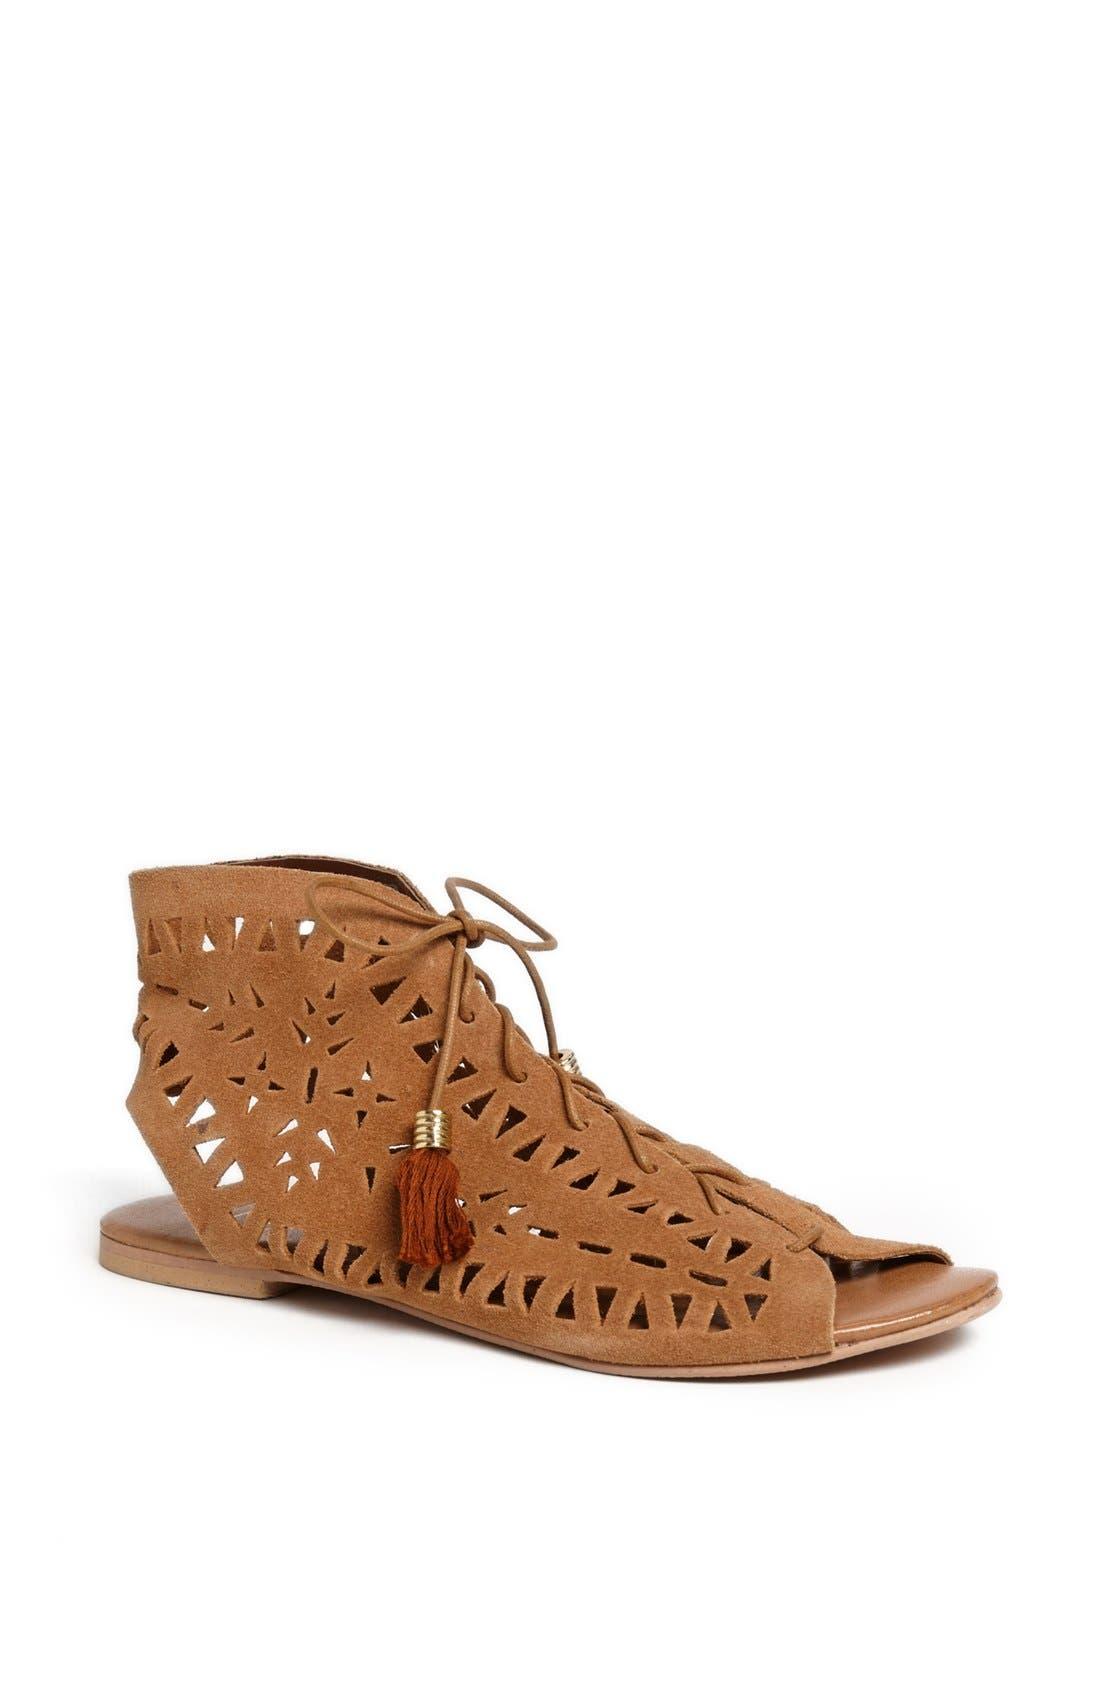 'Ascot Friday - Boheme' Sandal,                         Main,                         color, Tan